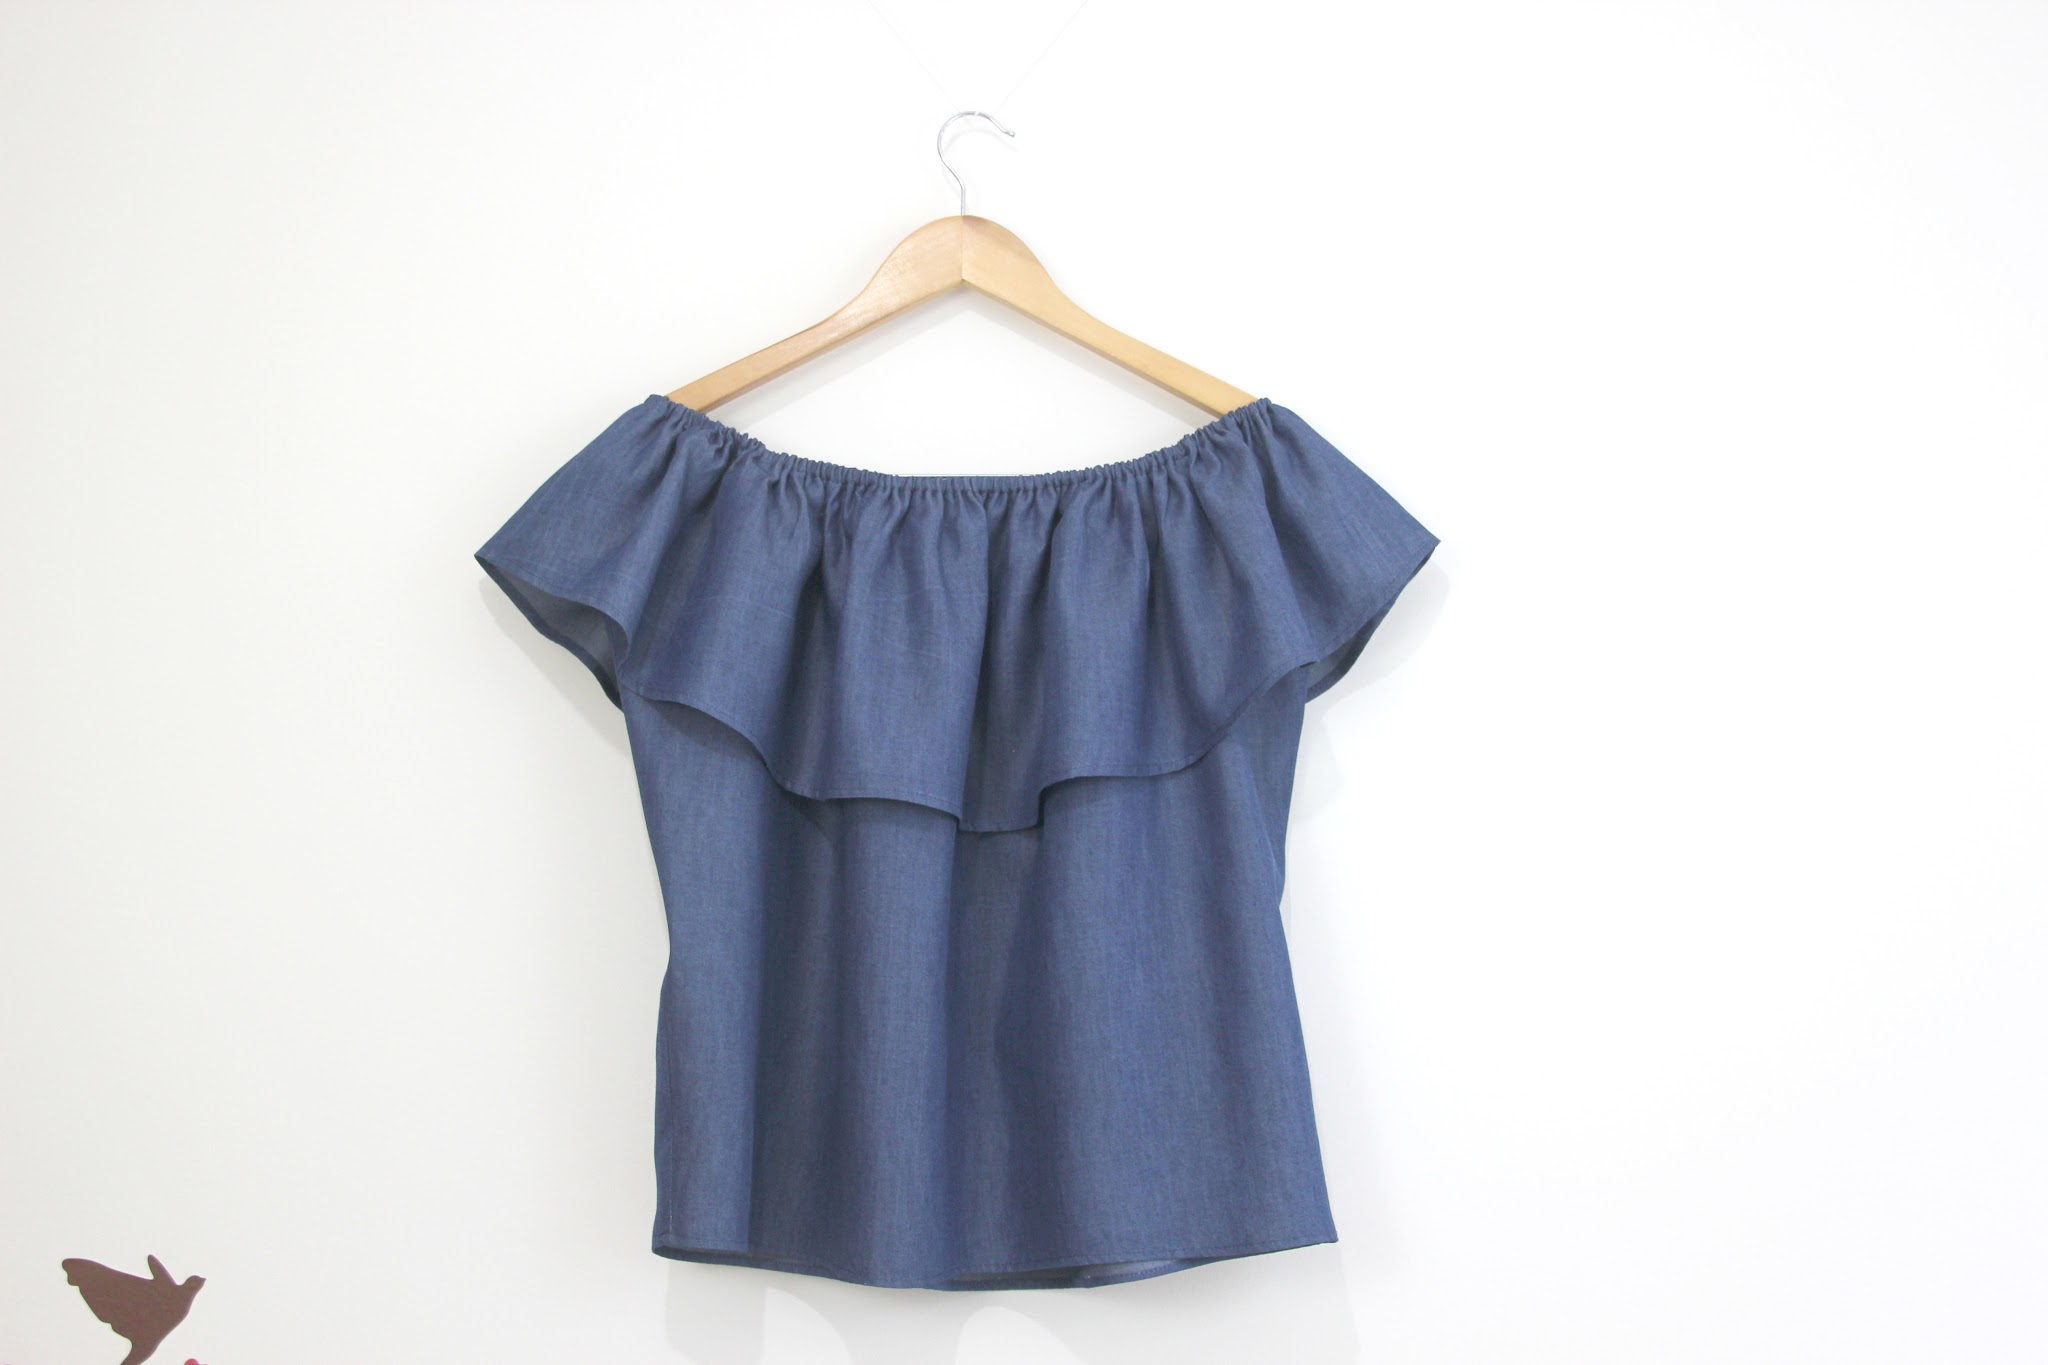 Resultado de imagem para molde de blusas sin hombros